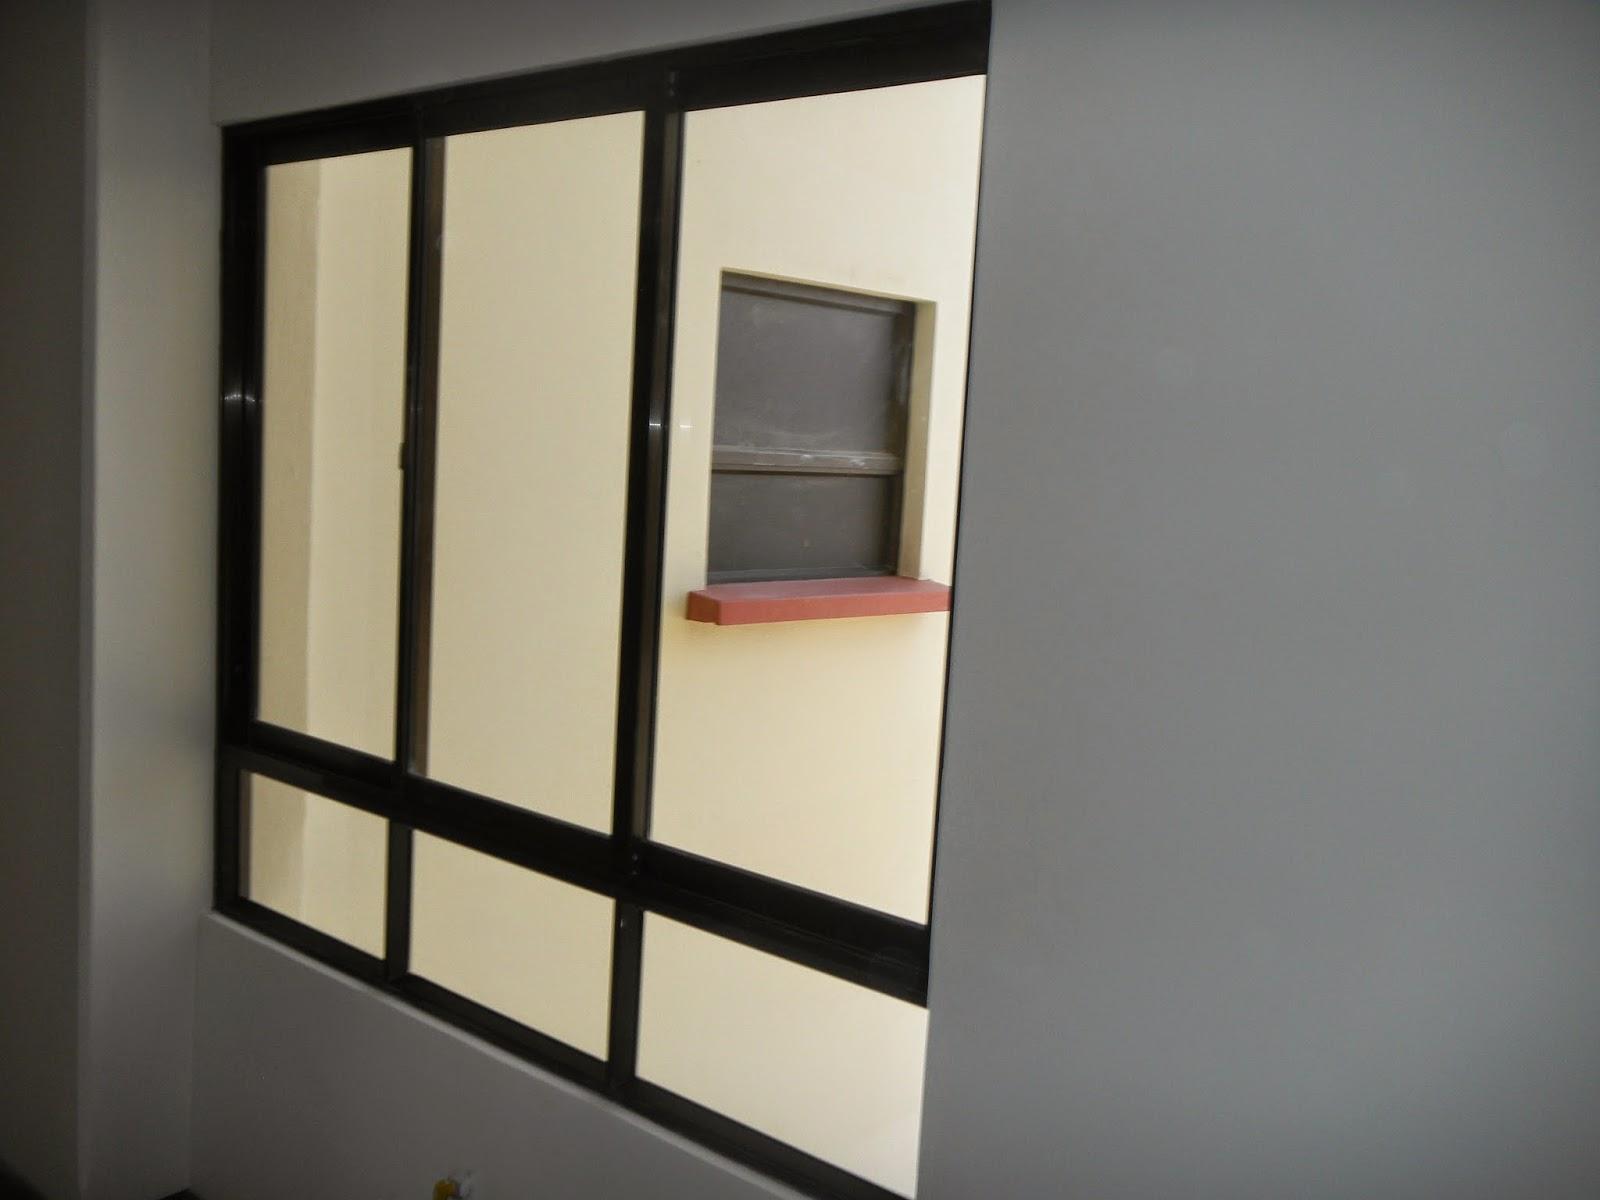 Puerta de aluminio con vidrio puerta aluminio x vidrio for Ventanas de aluminio color bronce